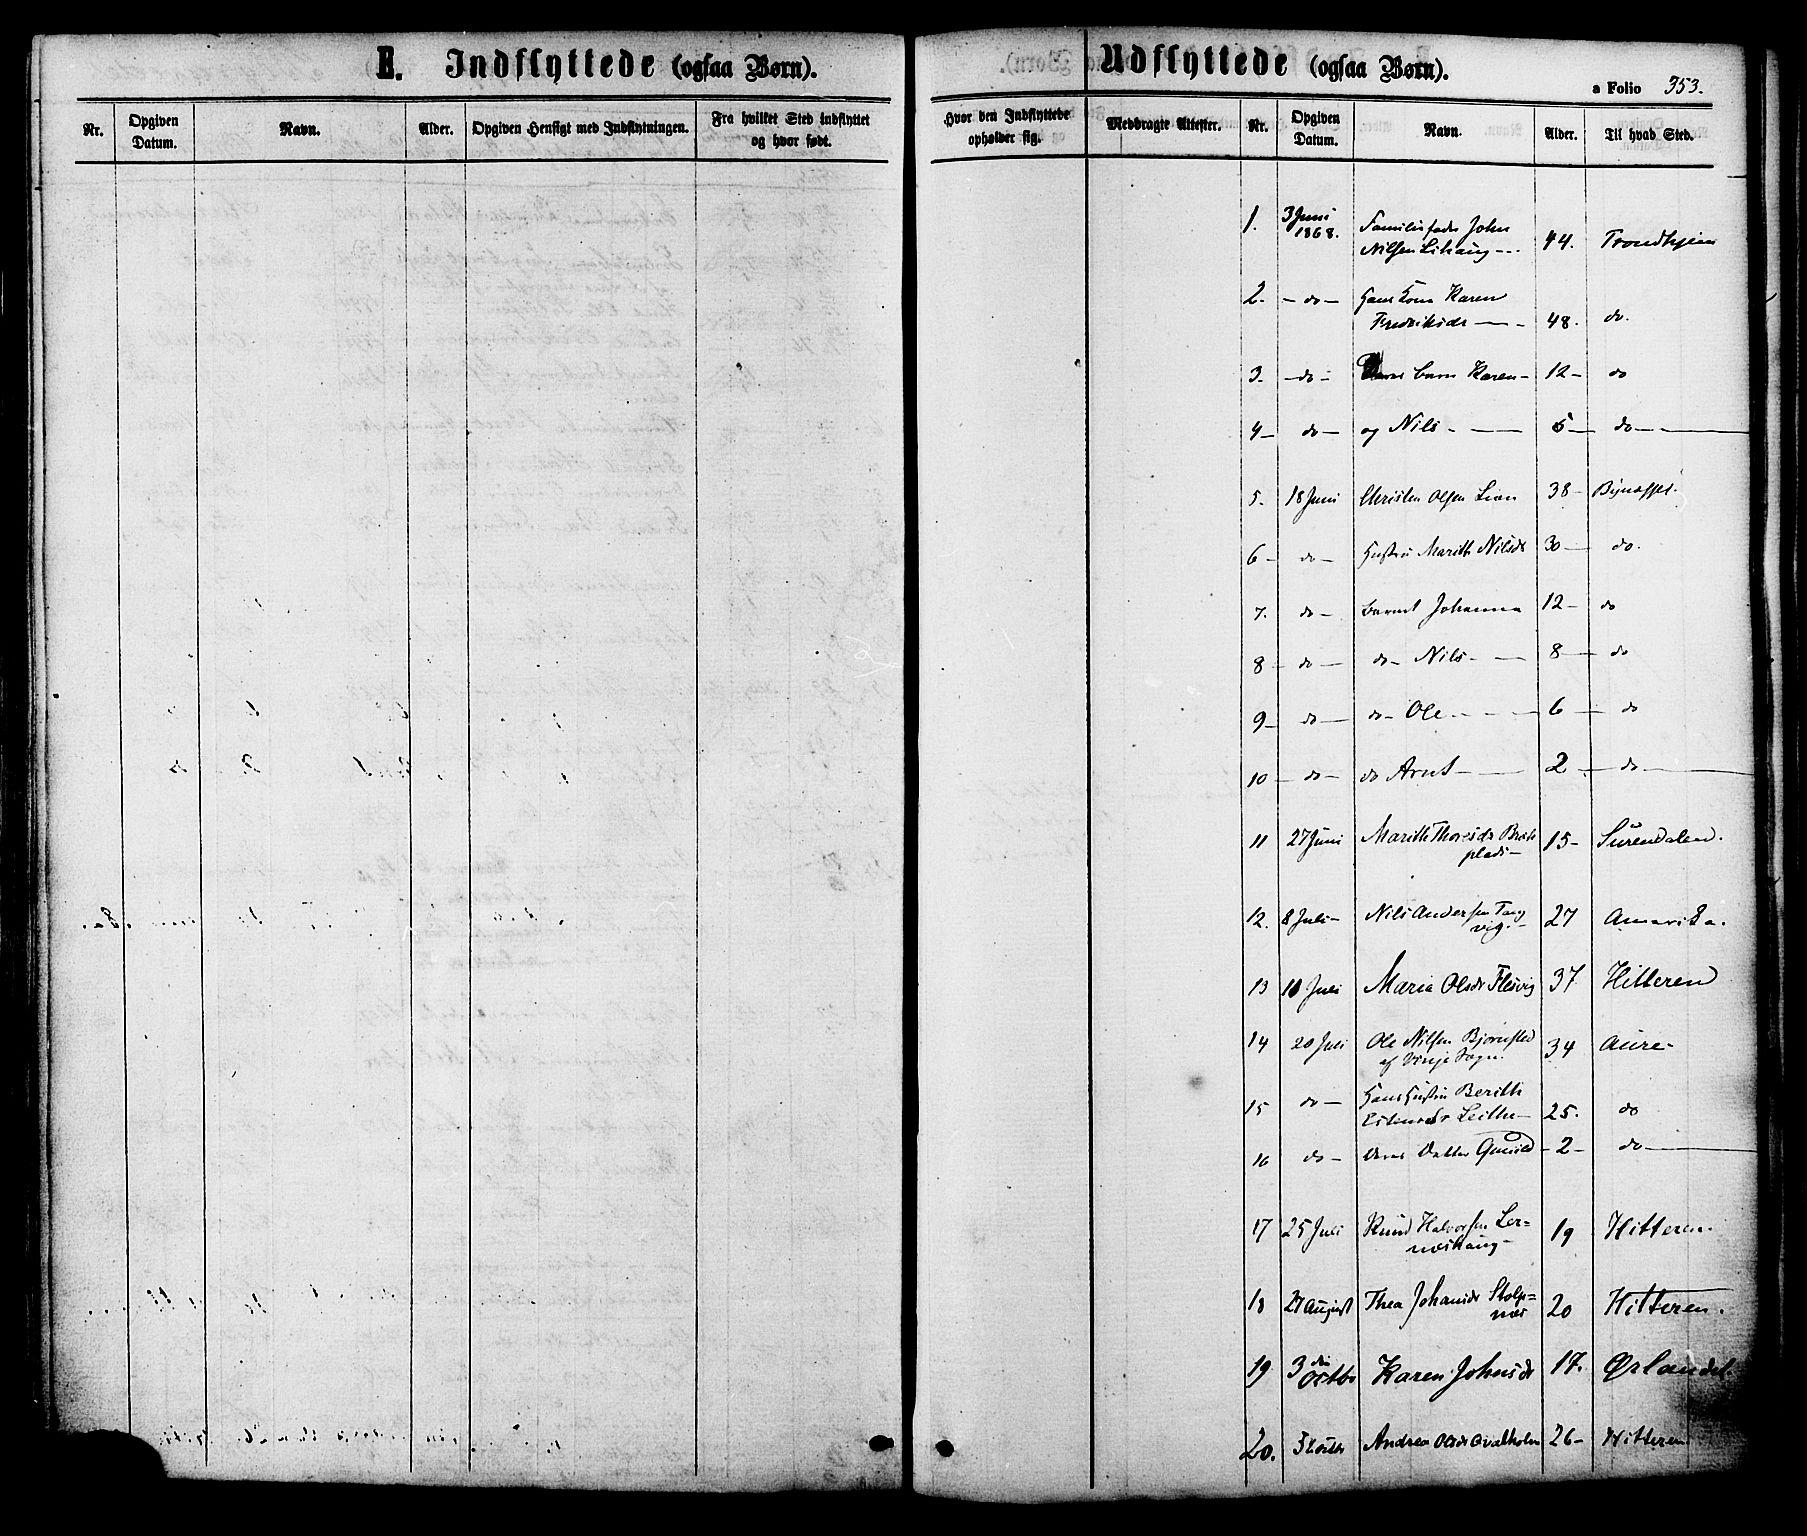 SAT, Ministerialprotokoller, klokkerbøker og fødselsregistre - Sør-Trøndelag, 630/L0495: Parish register (official) no. 630A08, 1868-1878, p. 353